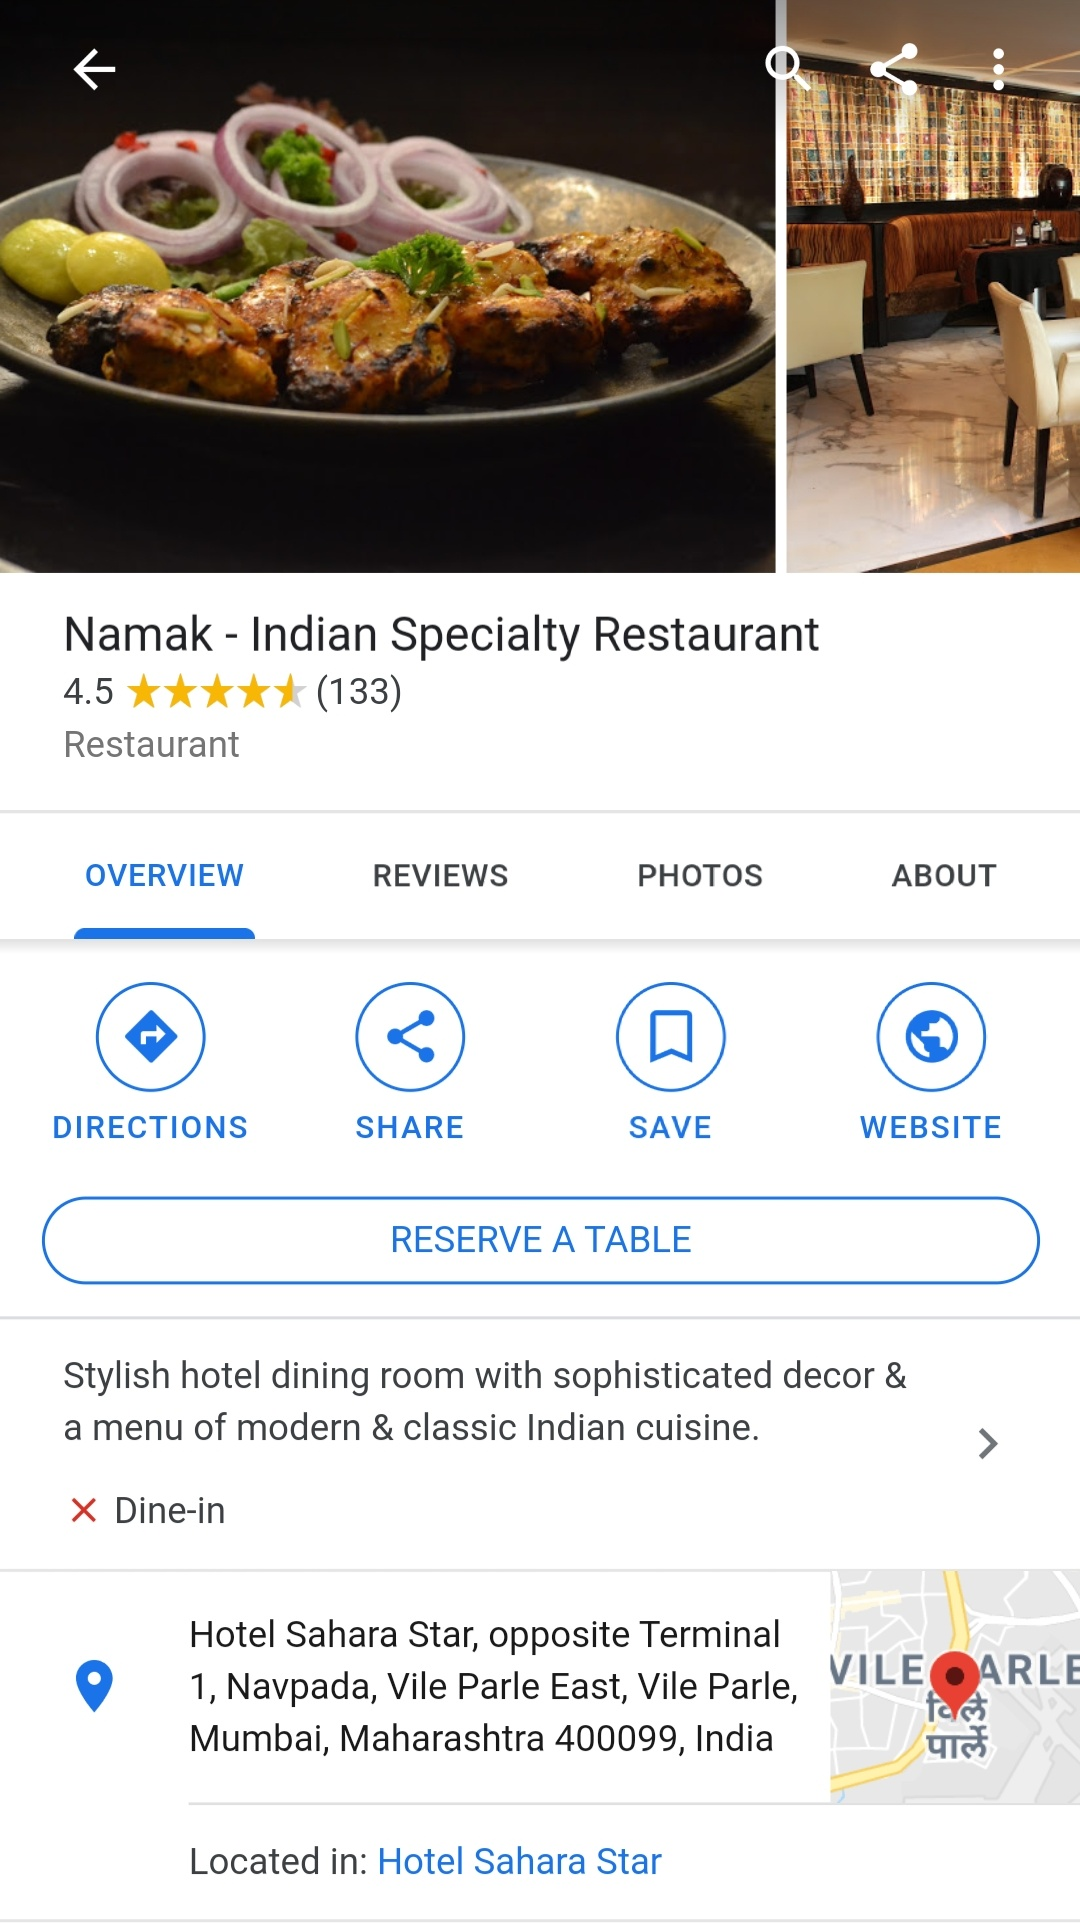 Namak restaurant information on Google